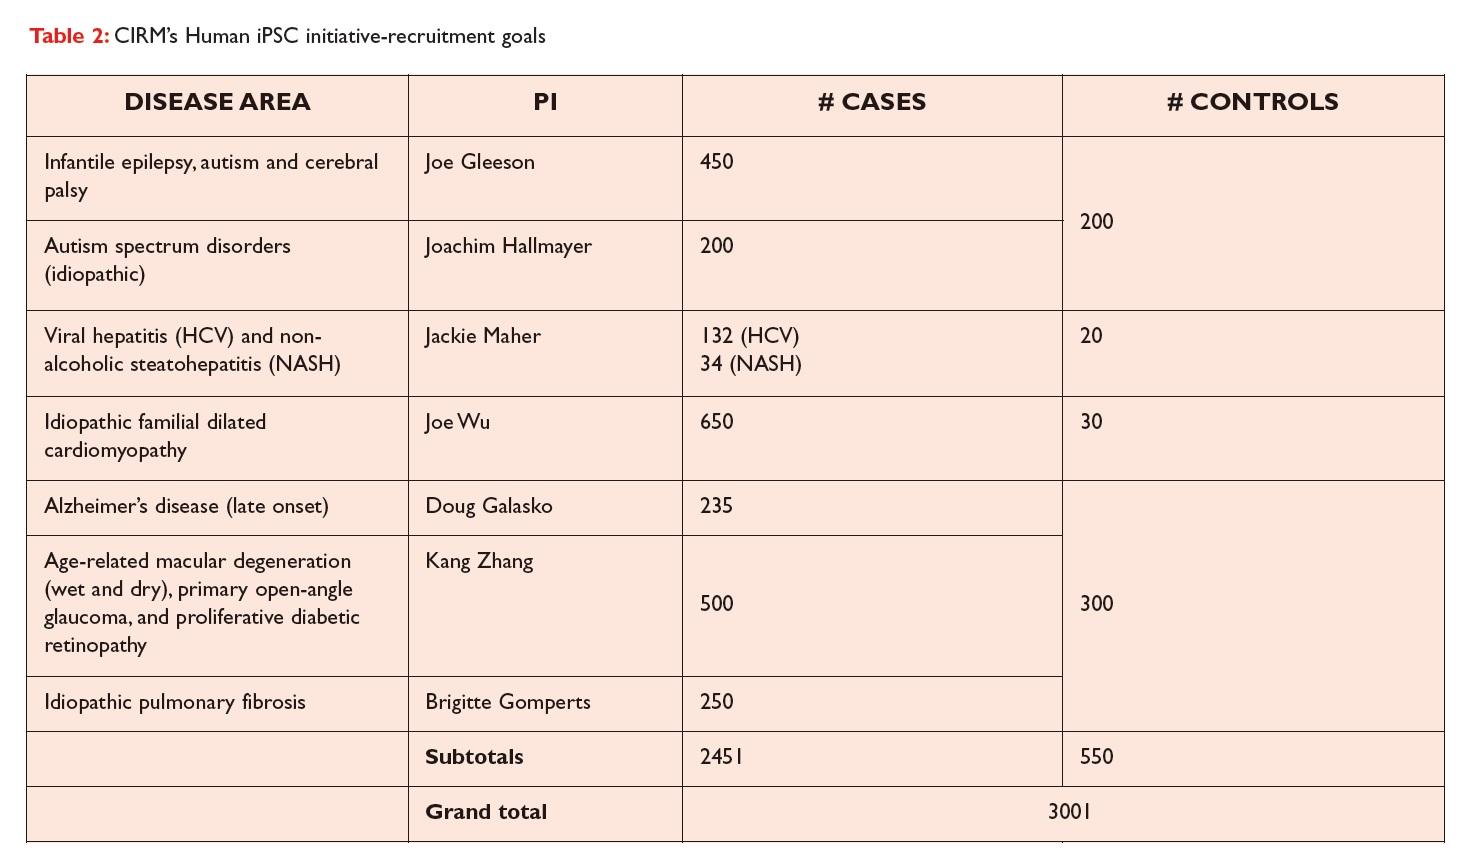 Table 2 CIRM's Human iPSC initiative-recruitment goals